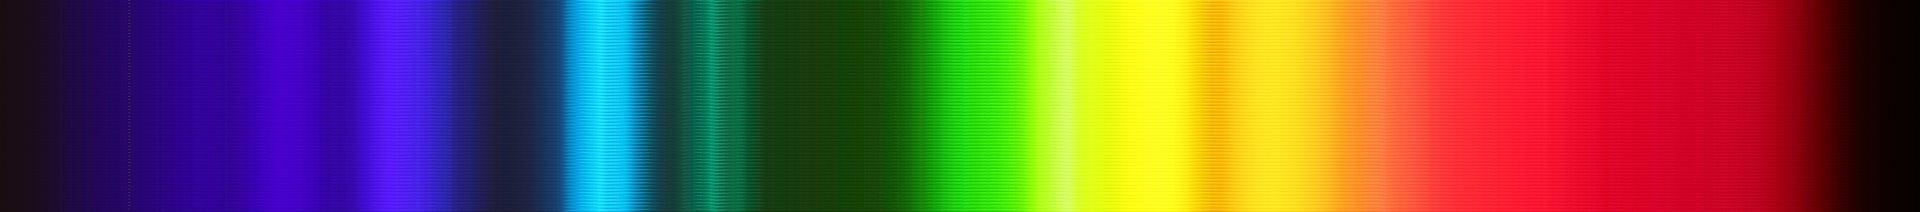 IMG_8324_NA-HD-Lampe_Spektrum_breit.jpg